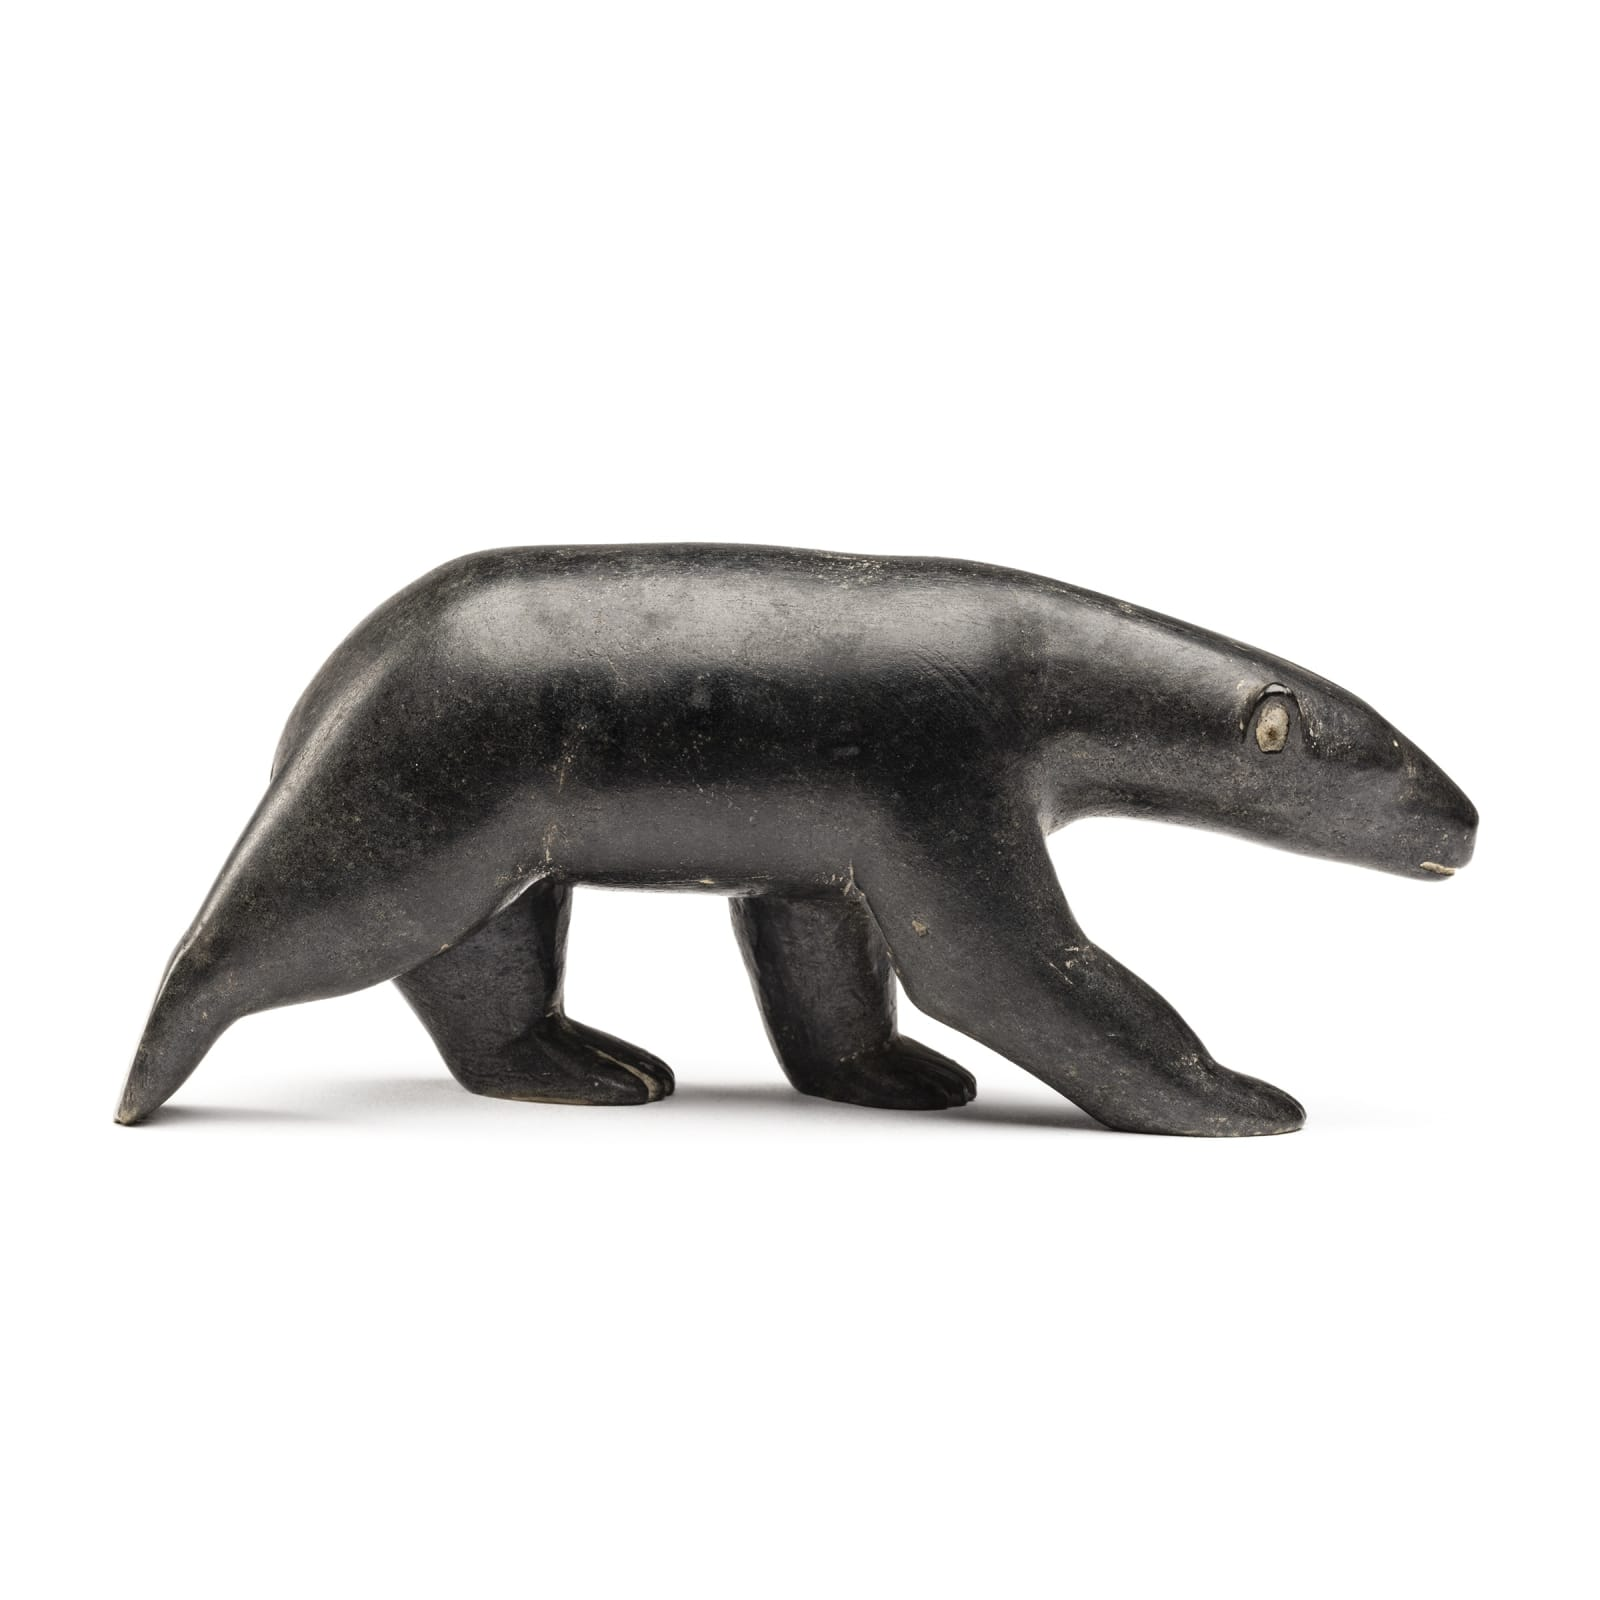 HENRY EVALUARDJUK (1927-2003) IqalUit (Frobisher Bay) Walking Bear, late 1950s REALIZED: $3,120